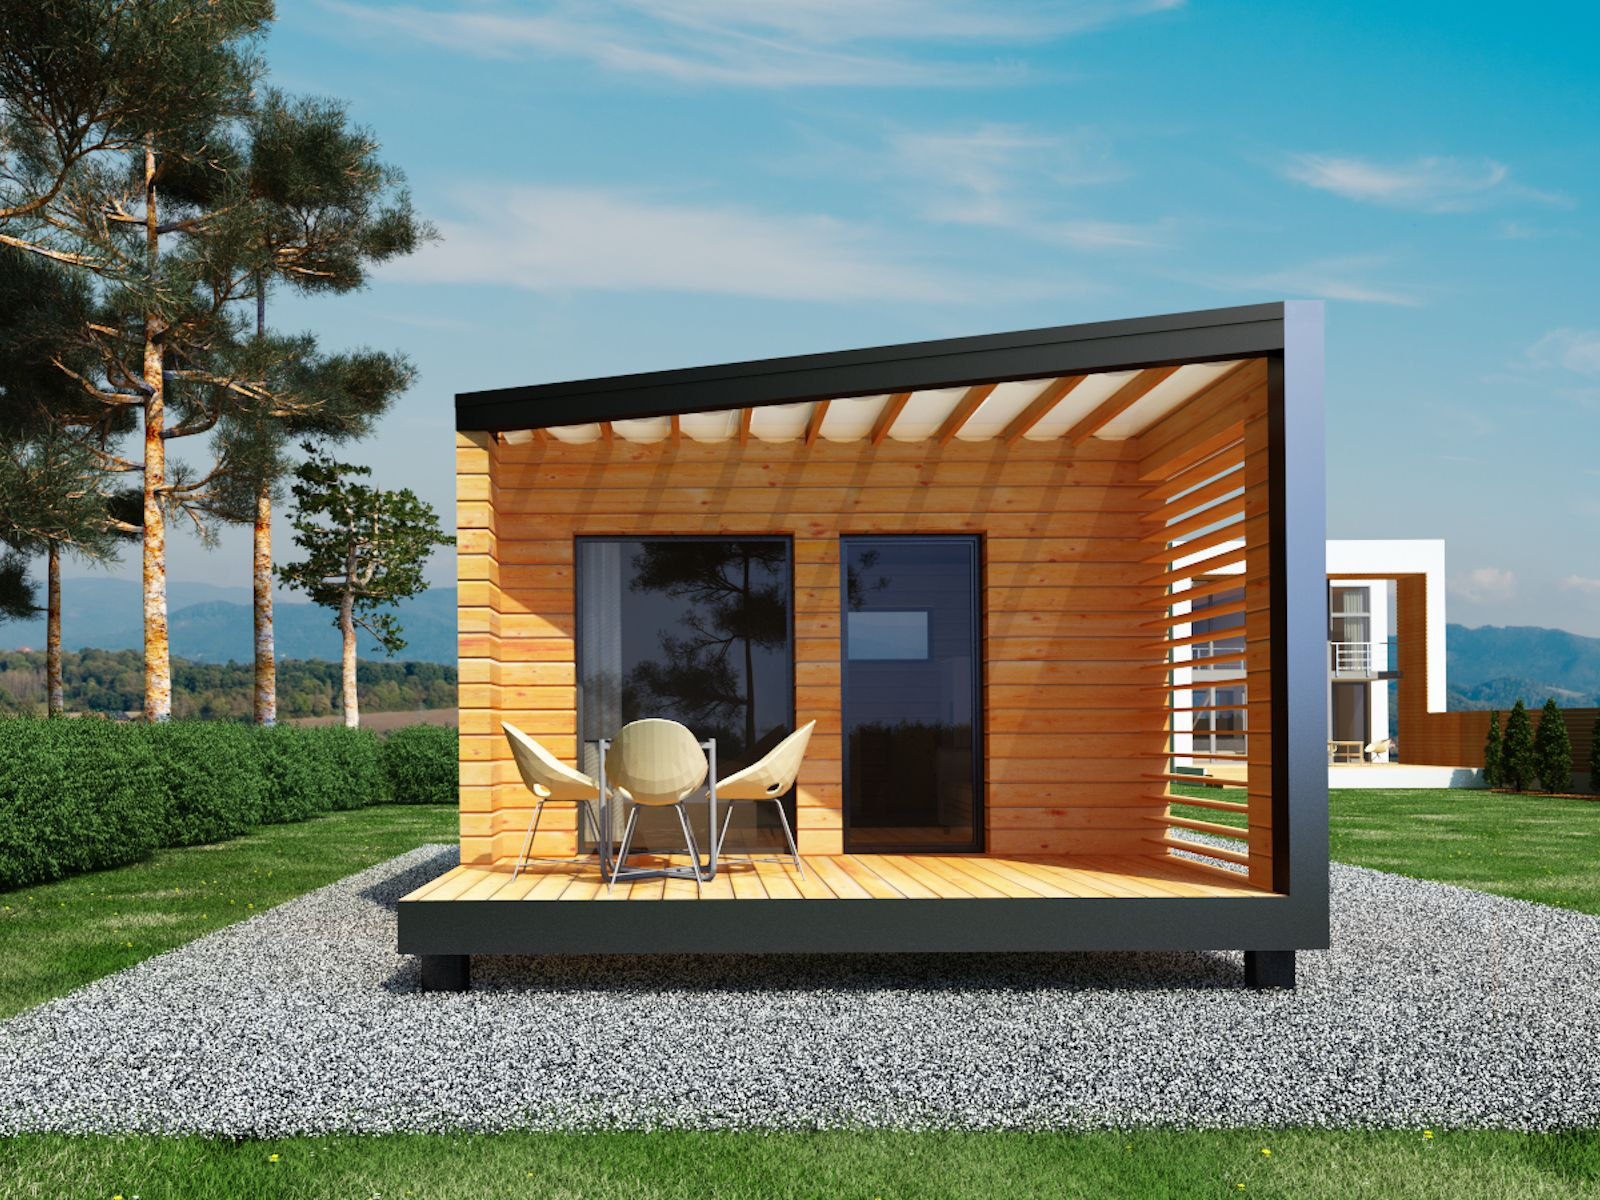 Studio De Jardin 20 M2, Sans Permis De Construire | Studio ... avec Studio De Jardin Habitable